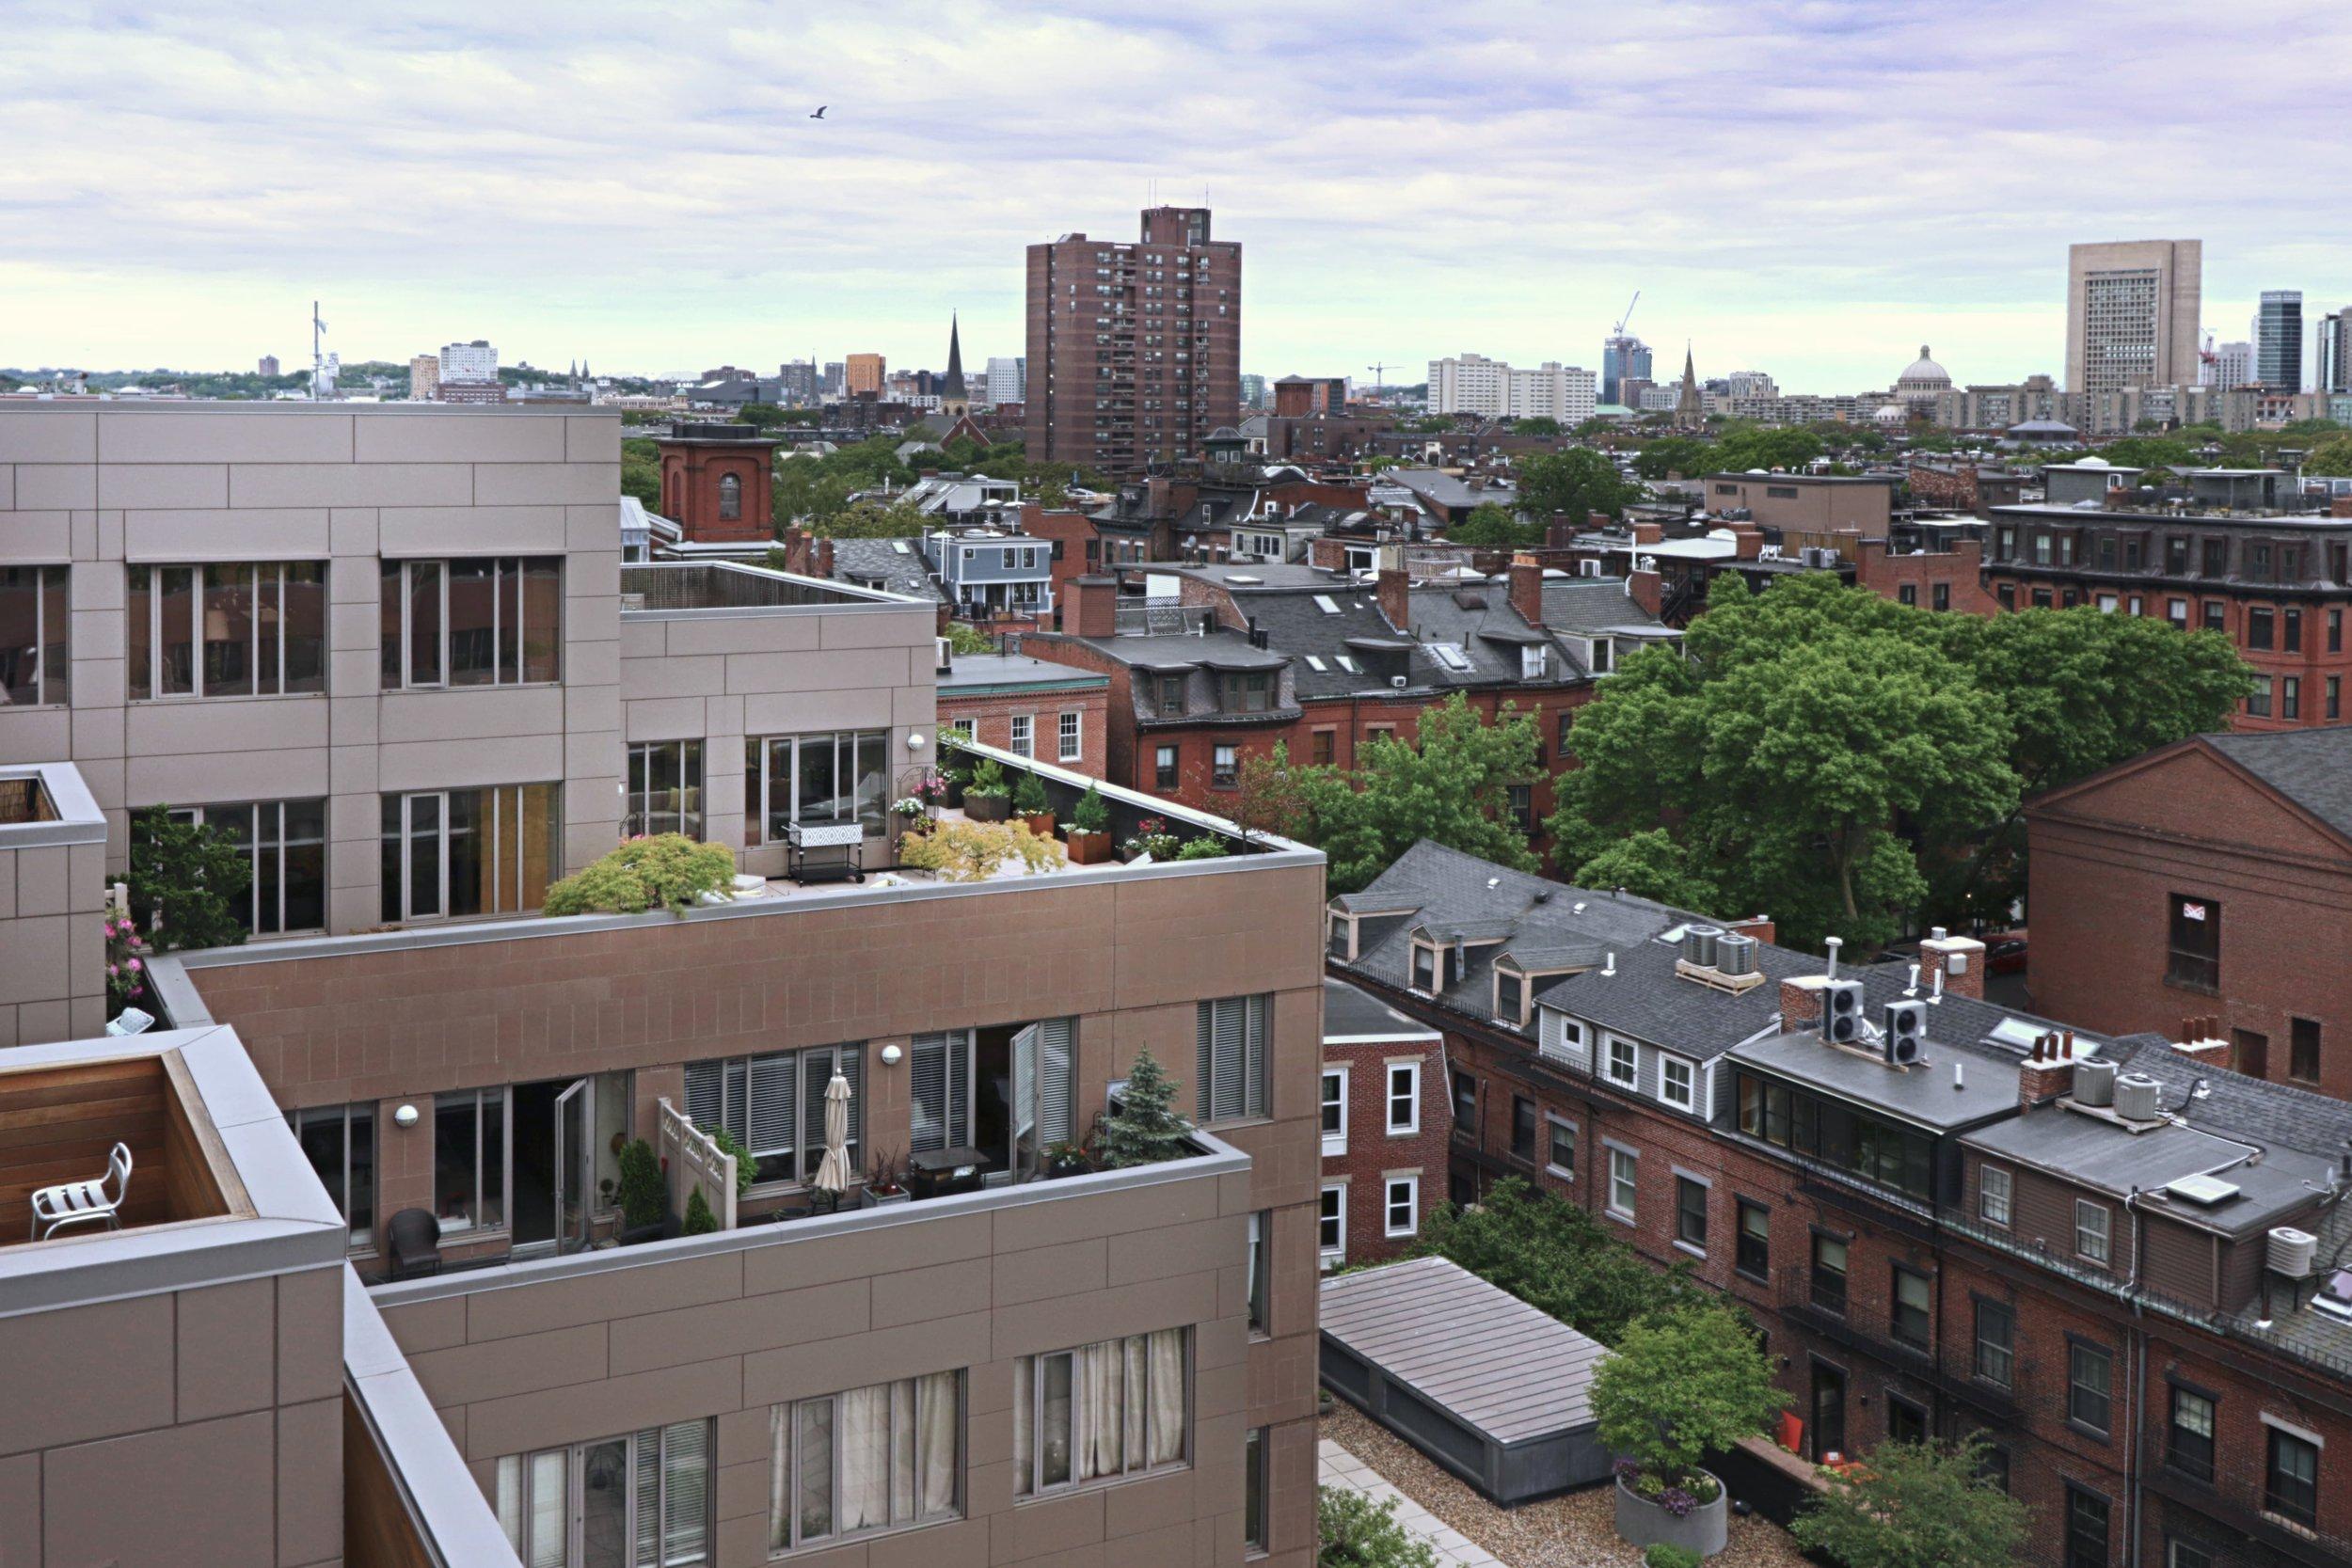 1313_Roof-min.jpg